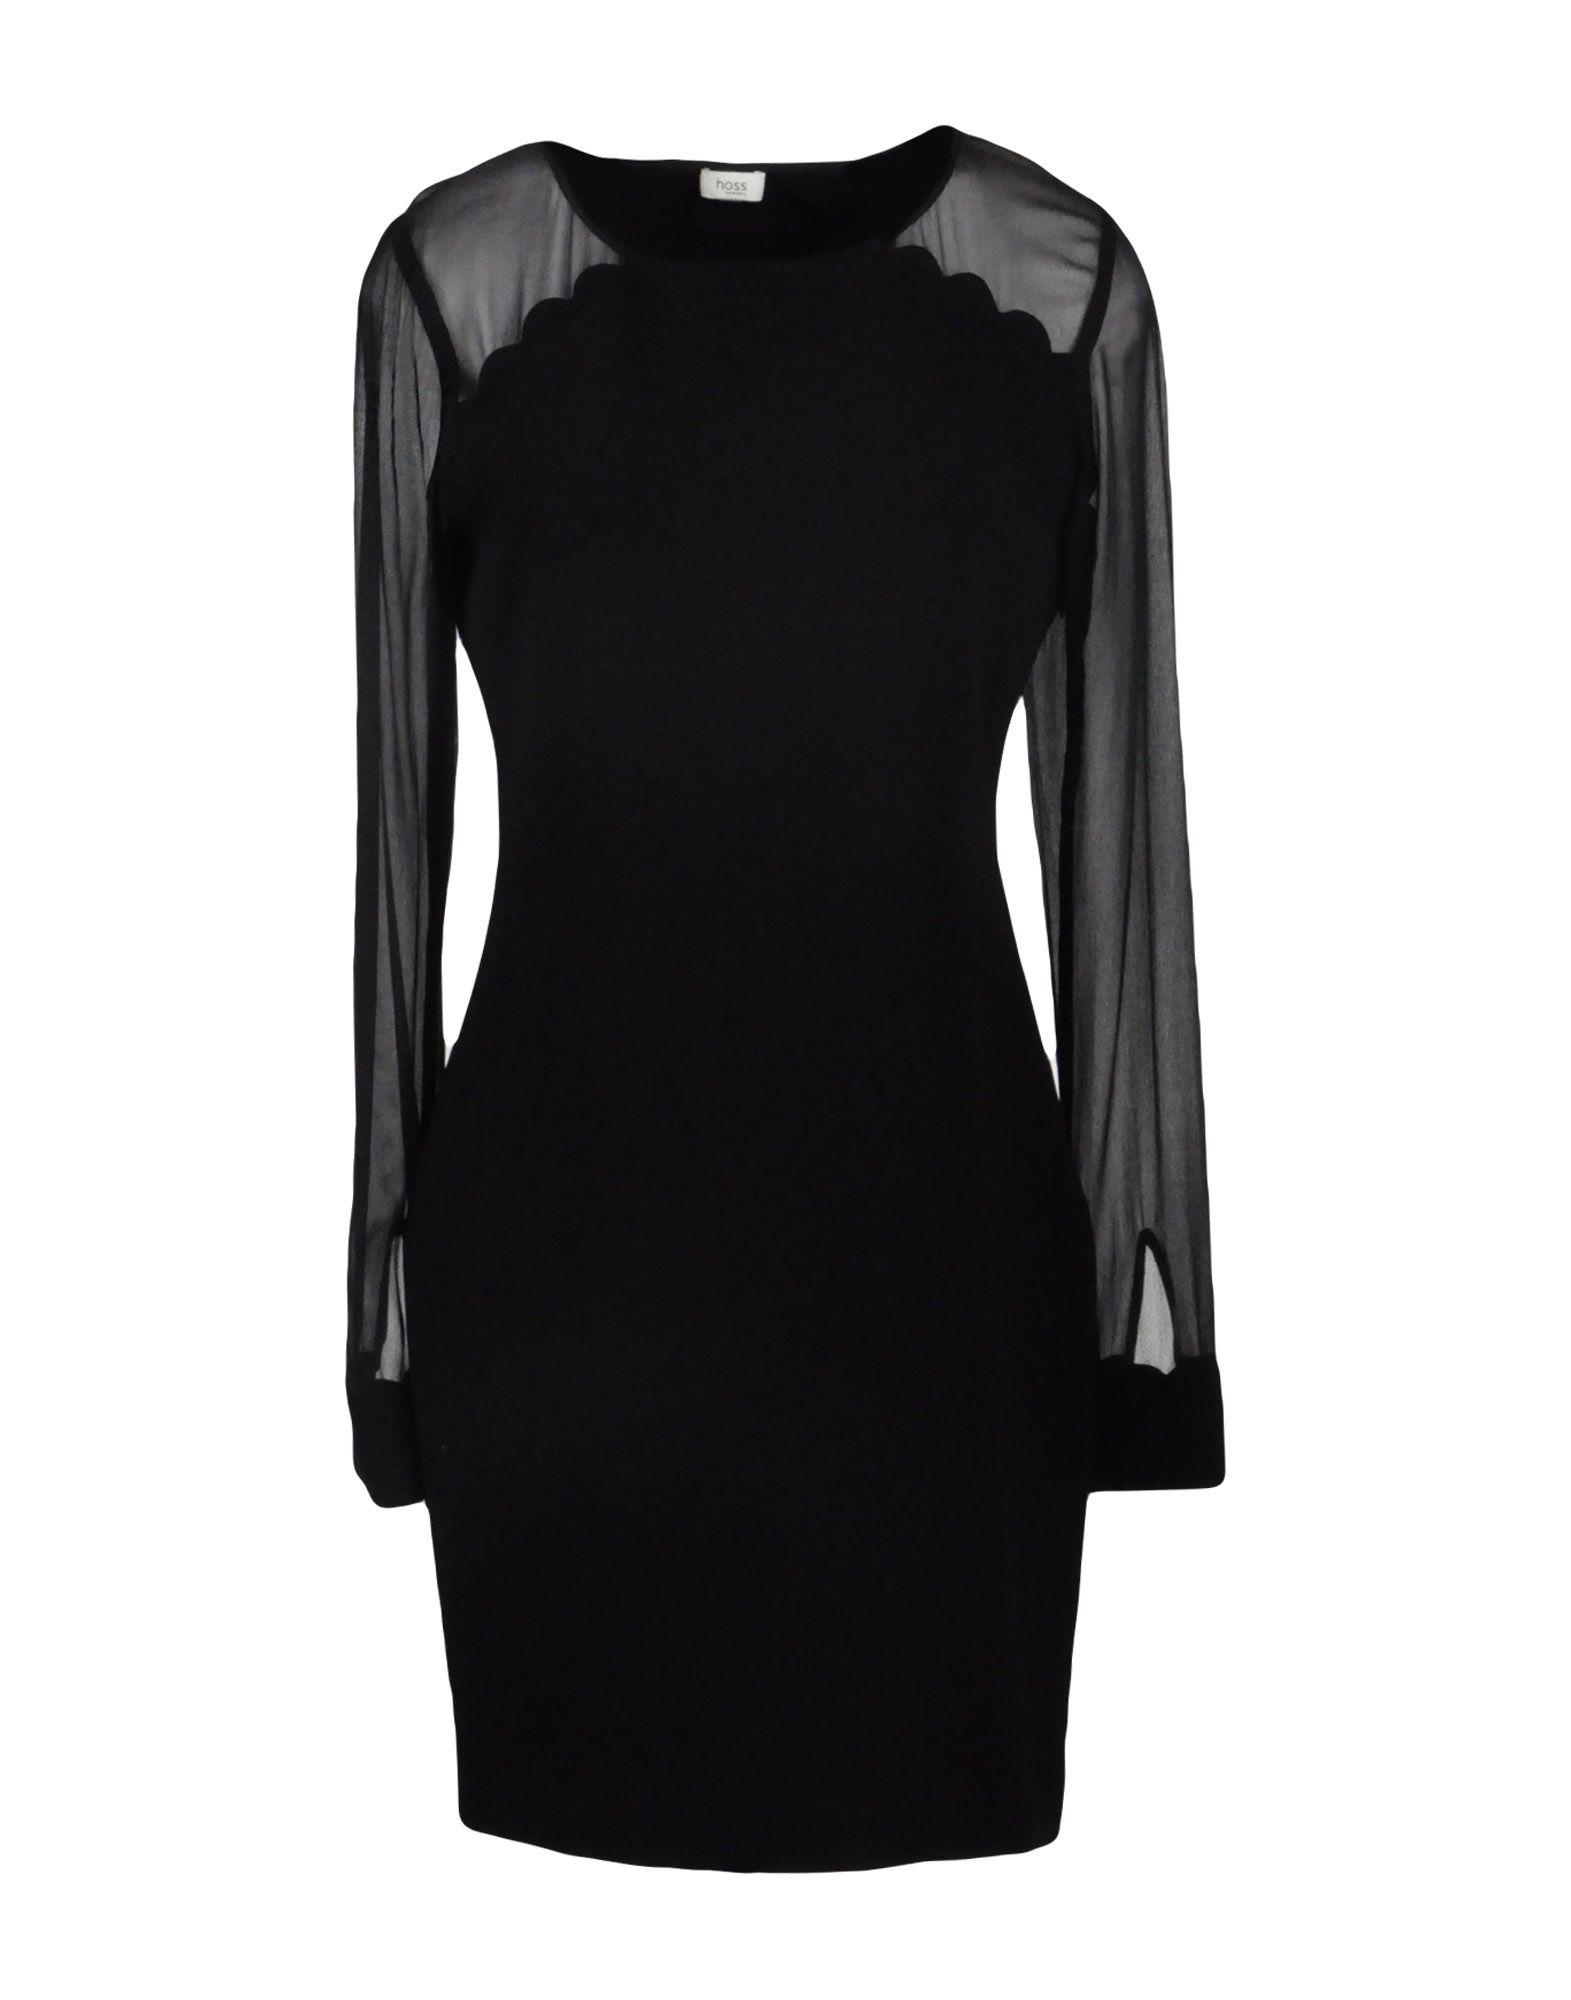 INTROPIA Короткое платье makoday шерстяное платье футляр